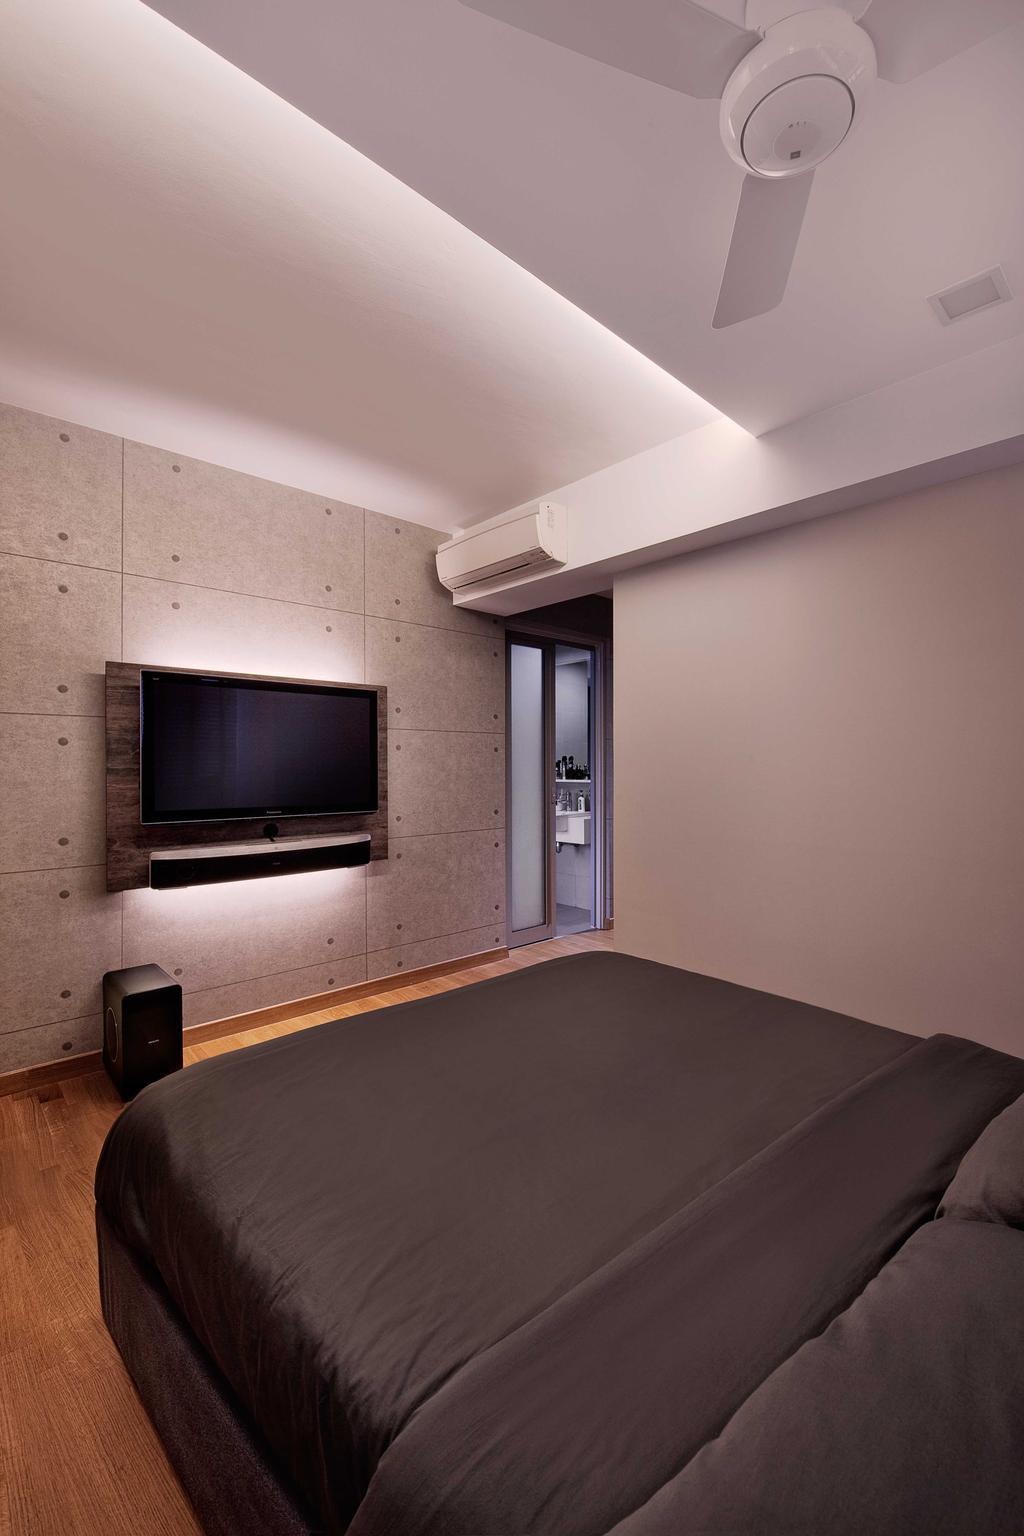 Scandinavian, HDB, Bedroom, The Peak, Interior Designer, Absolook Interior Design, Wall Mount Tv, Metal Panels, Wood Flooring, Electronics, Monitor, Screen, Tv, Television, Building, Housing, Indoors, Loft